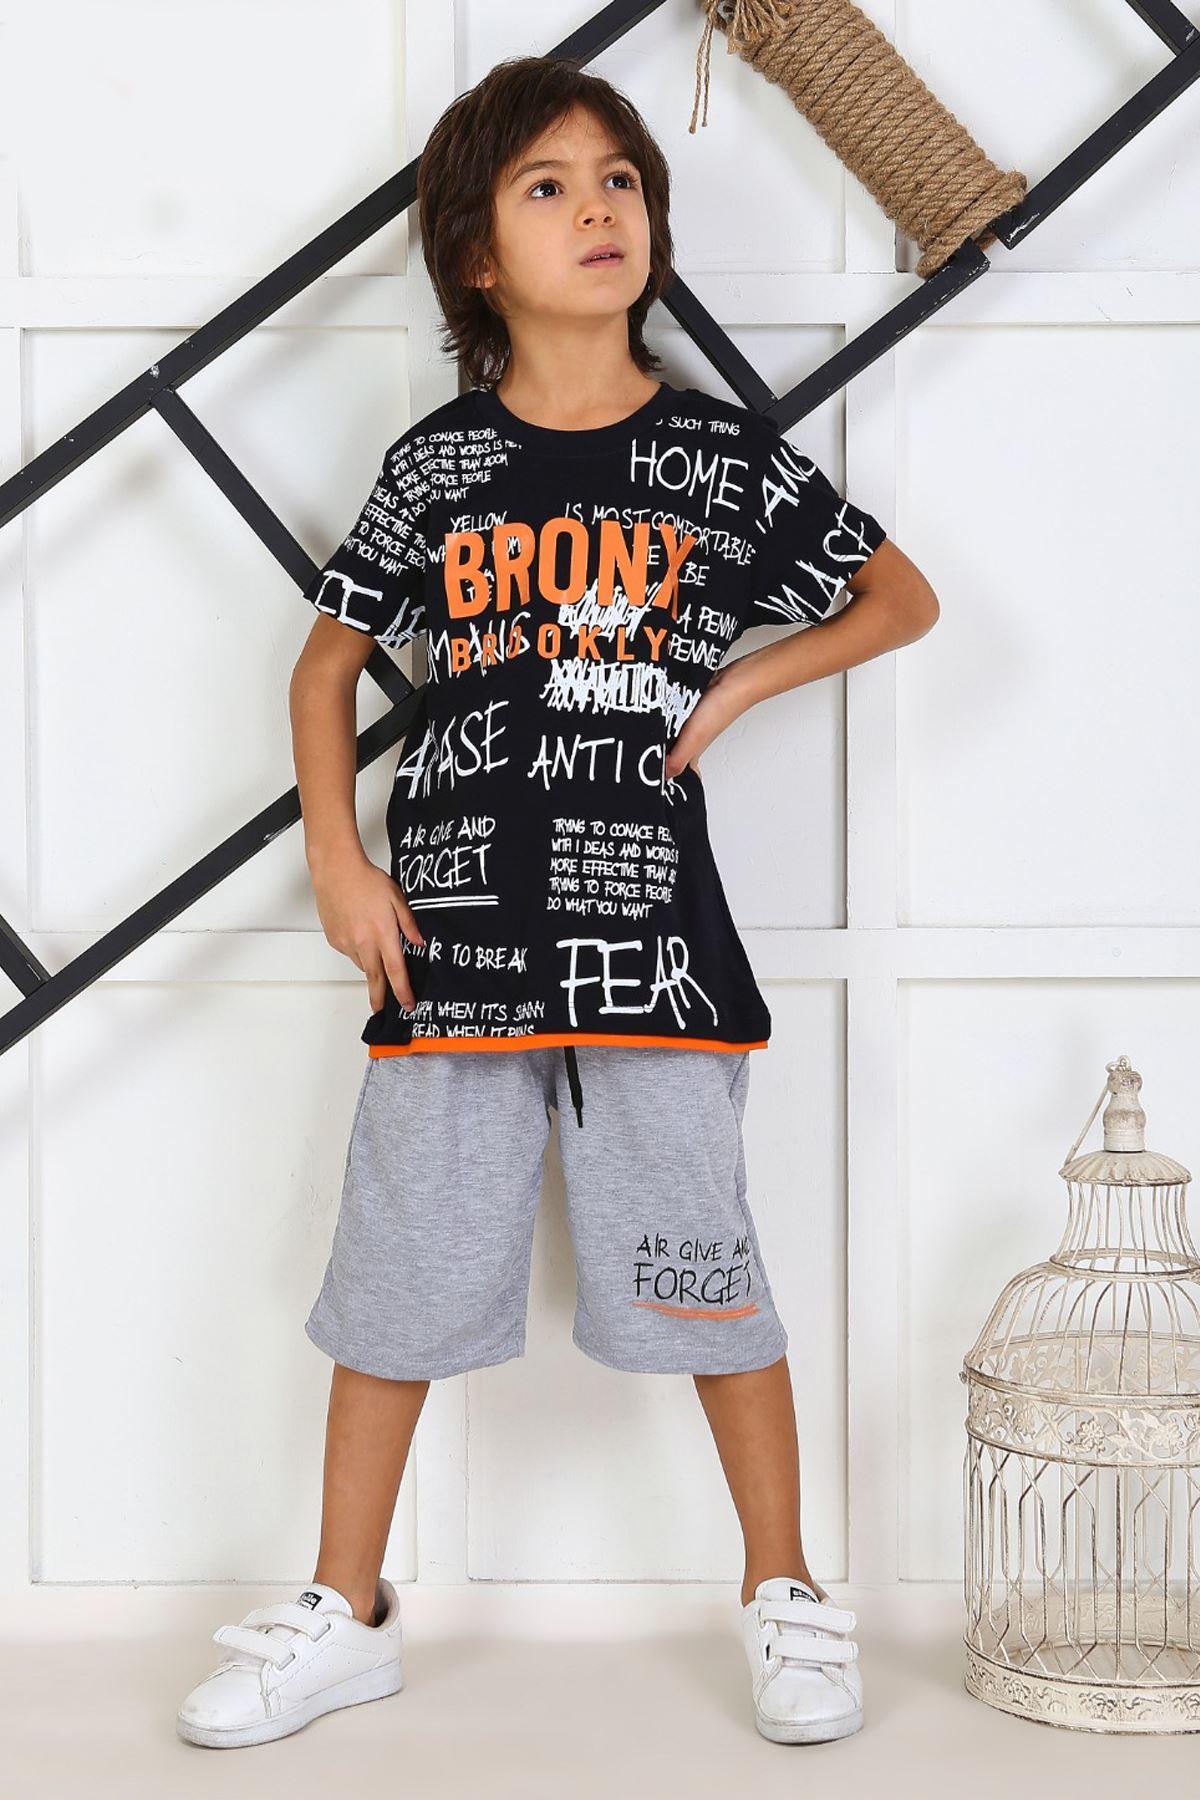 Navy Blue Child Boy Teenage Male Clothes Suit Summer Children T-Shirt Shorts 2 Piece Clothing Set Beach Boys outfits Sport Model